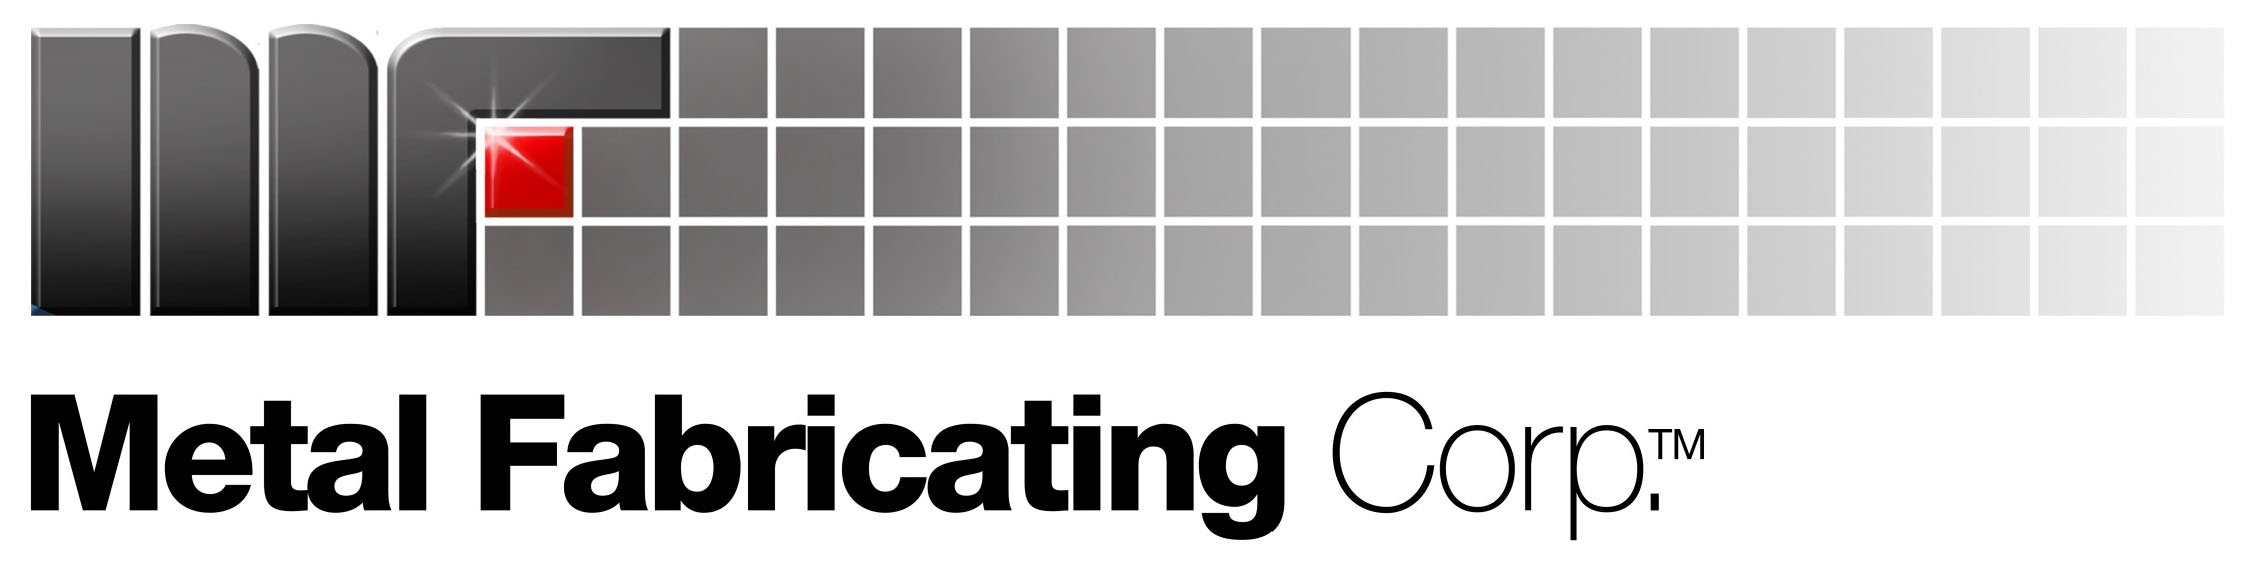 Metal Fabricating Corporation Logo